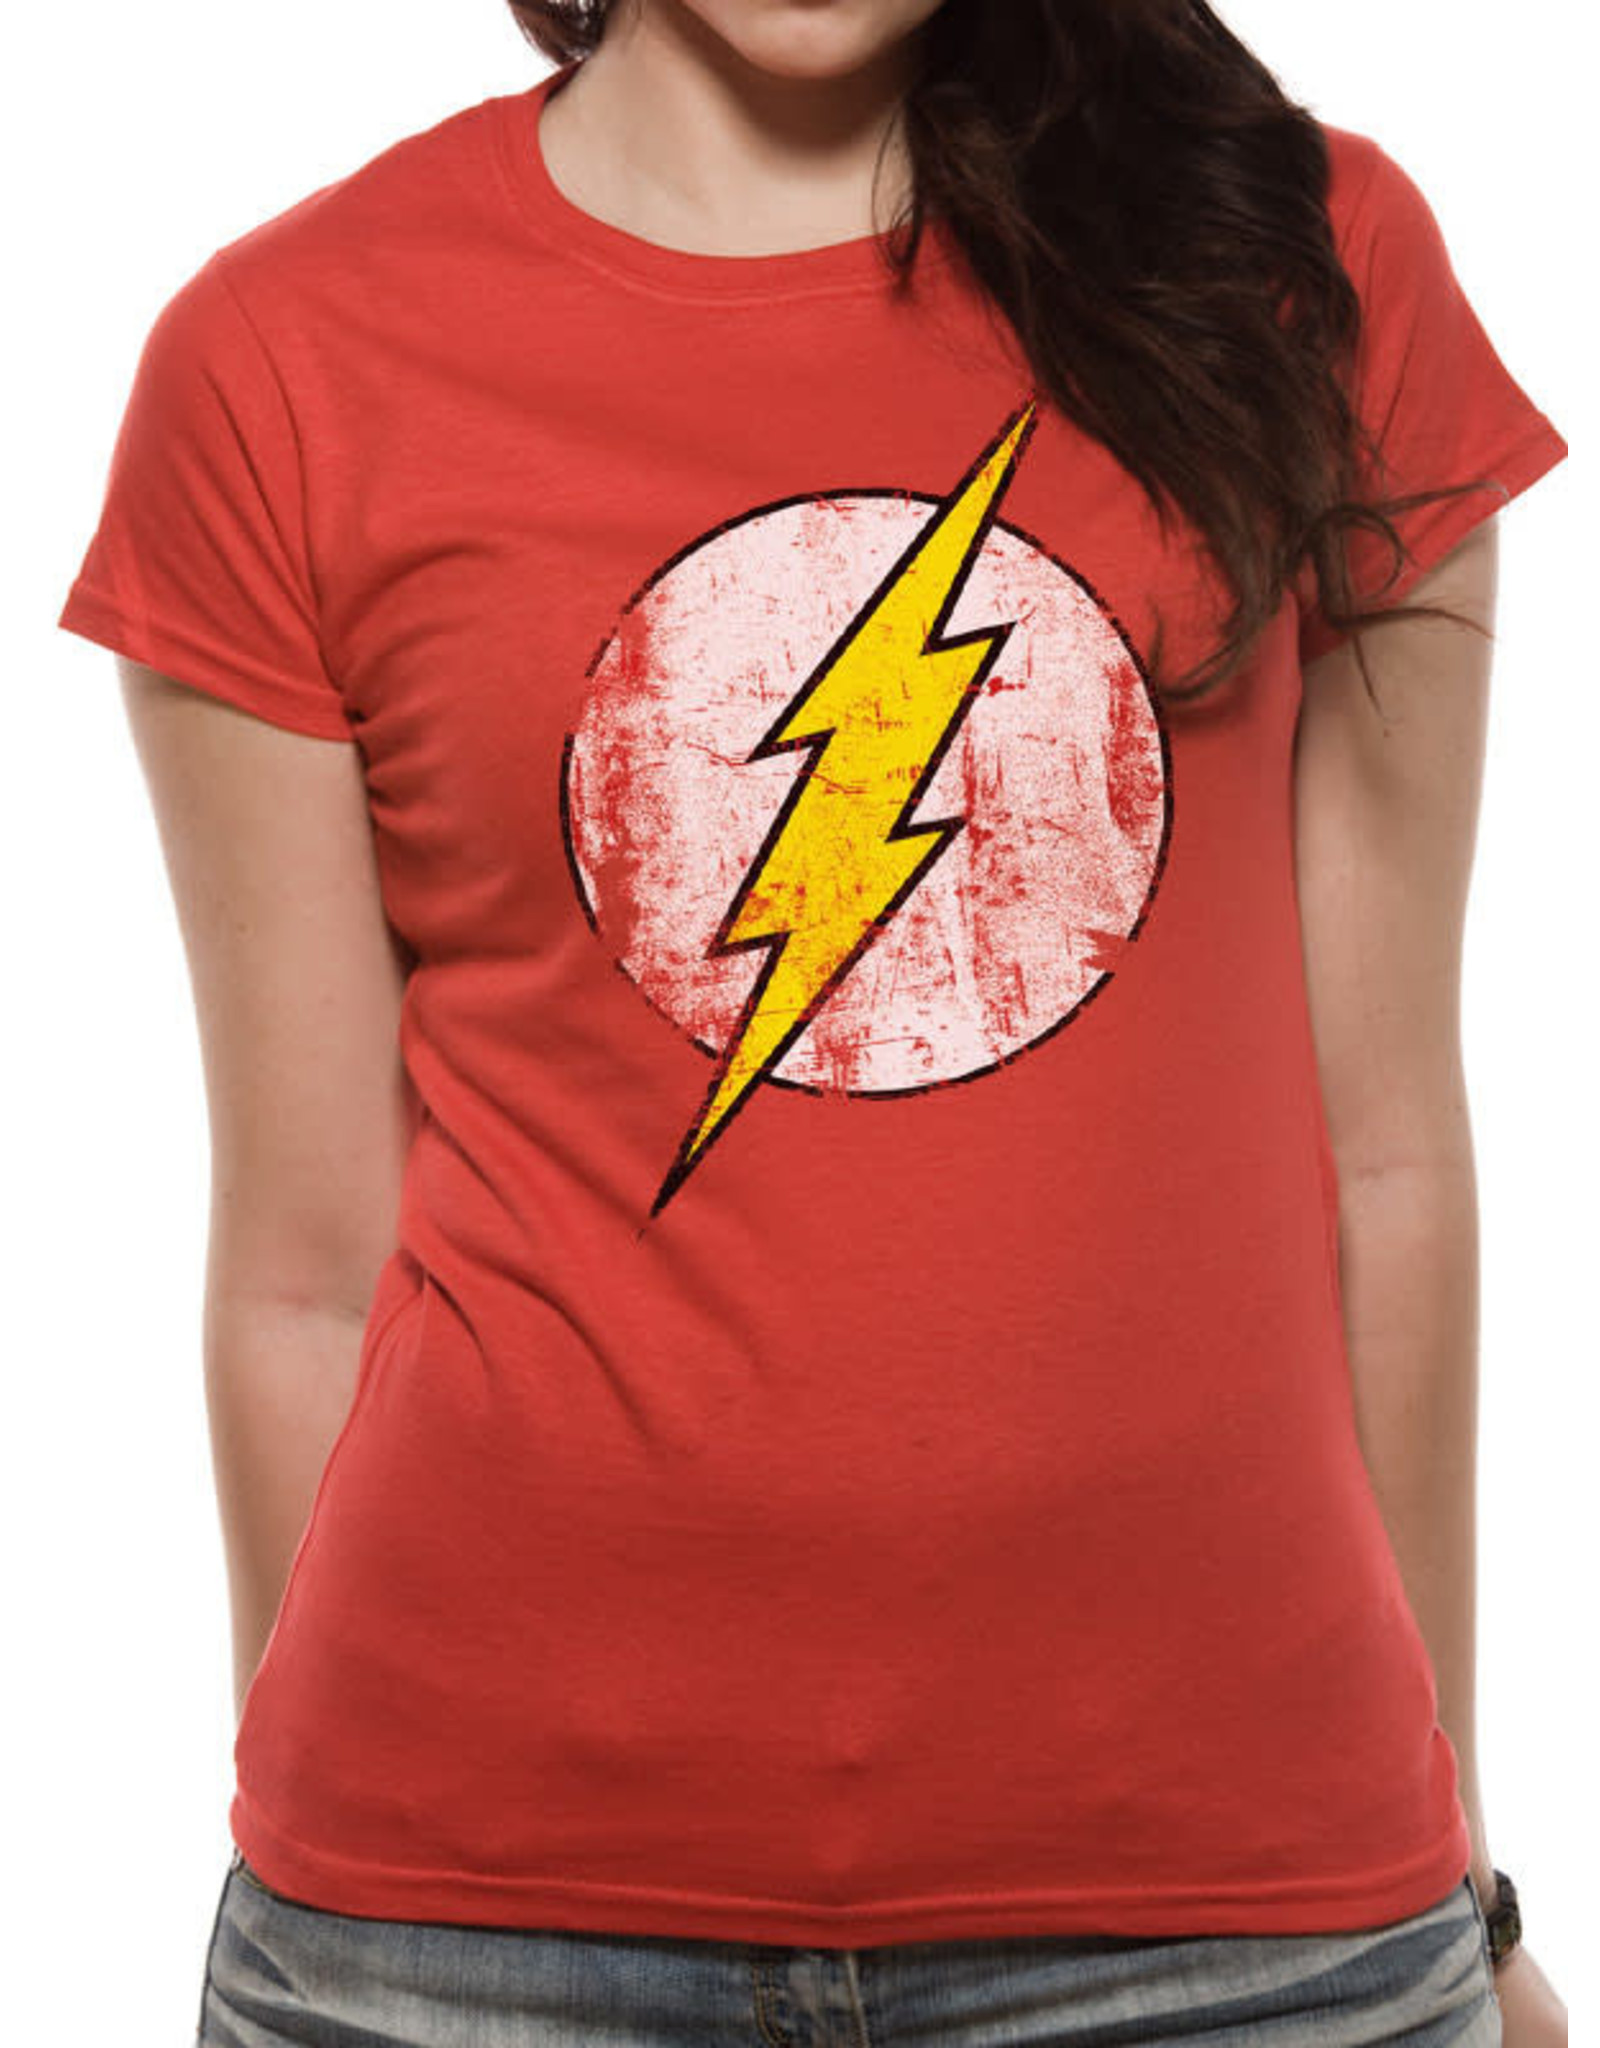 FLASH - T-Shirt IN A TUBE- Distressed Logo WOMAN (XL)